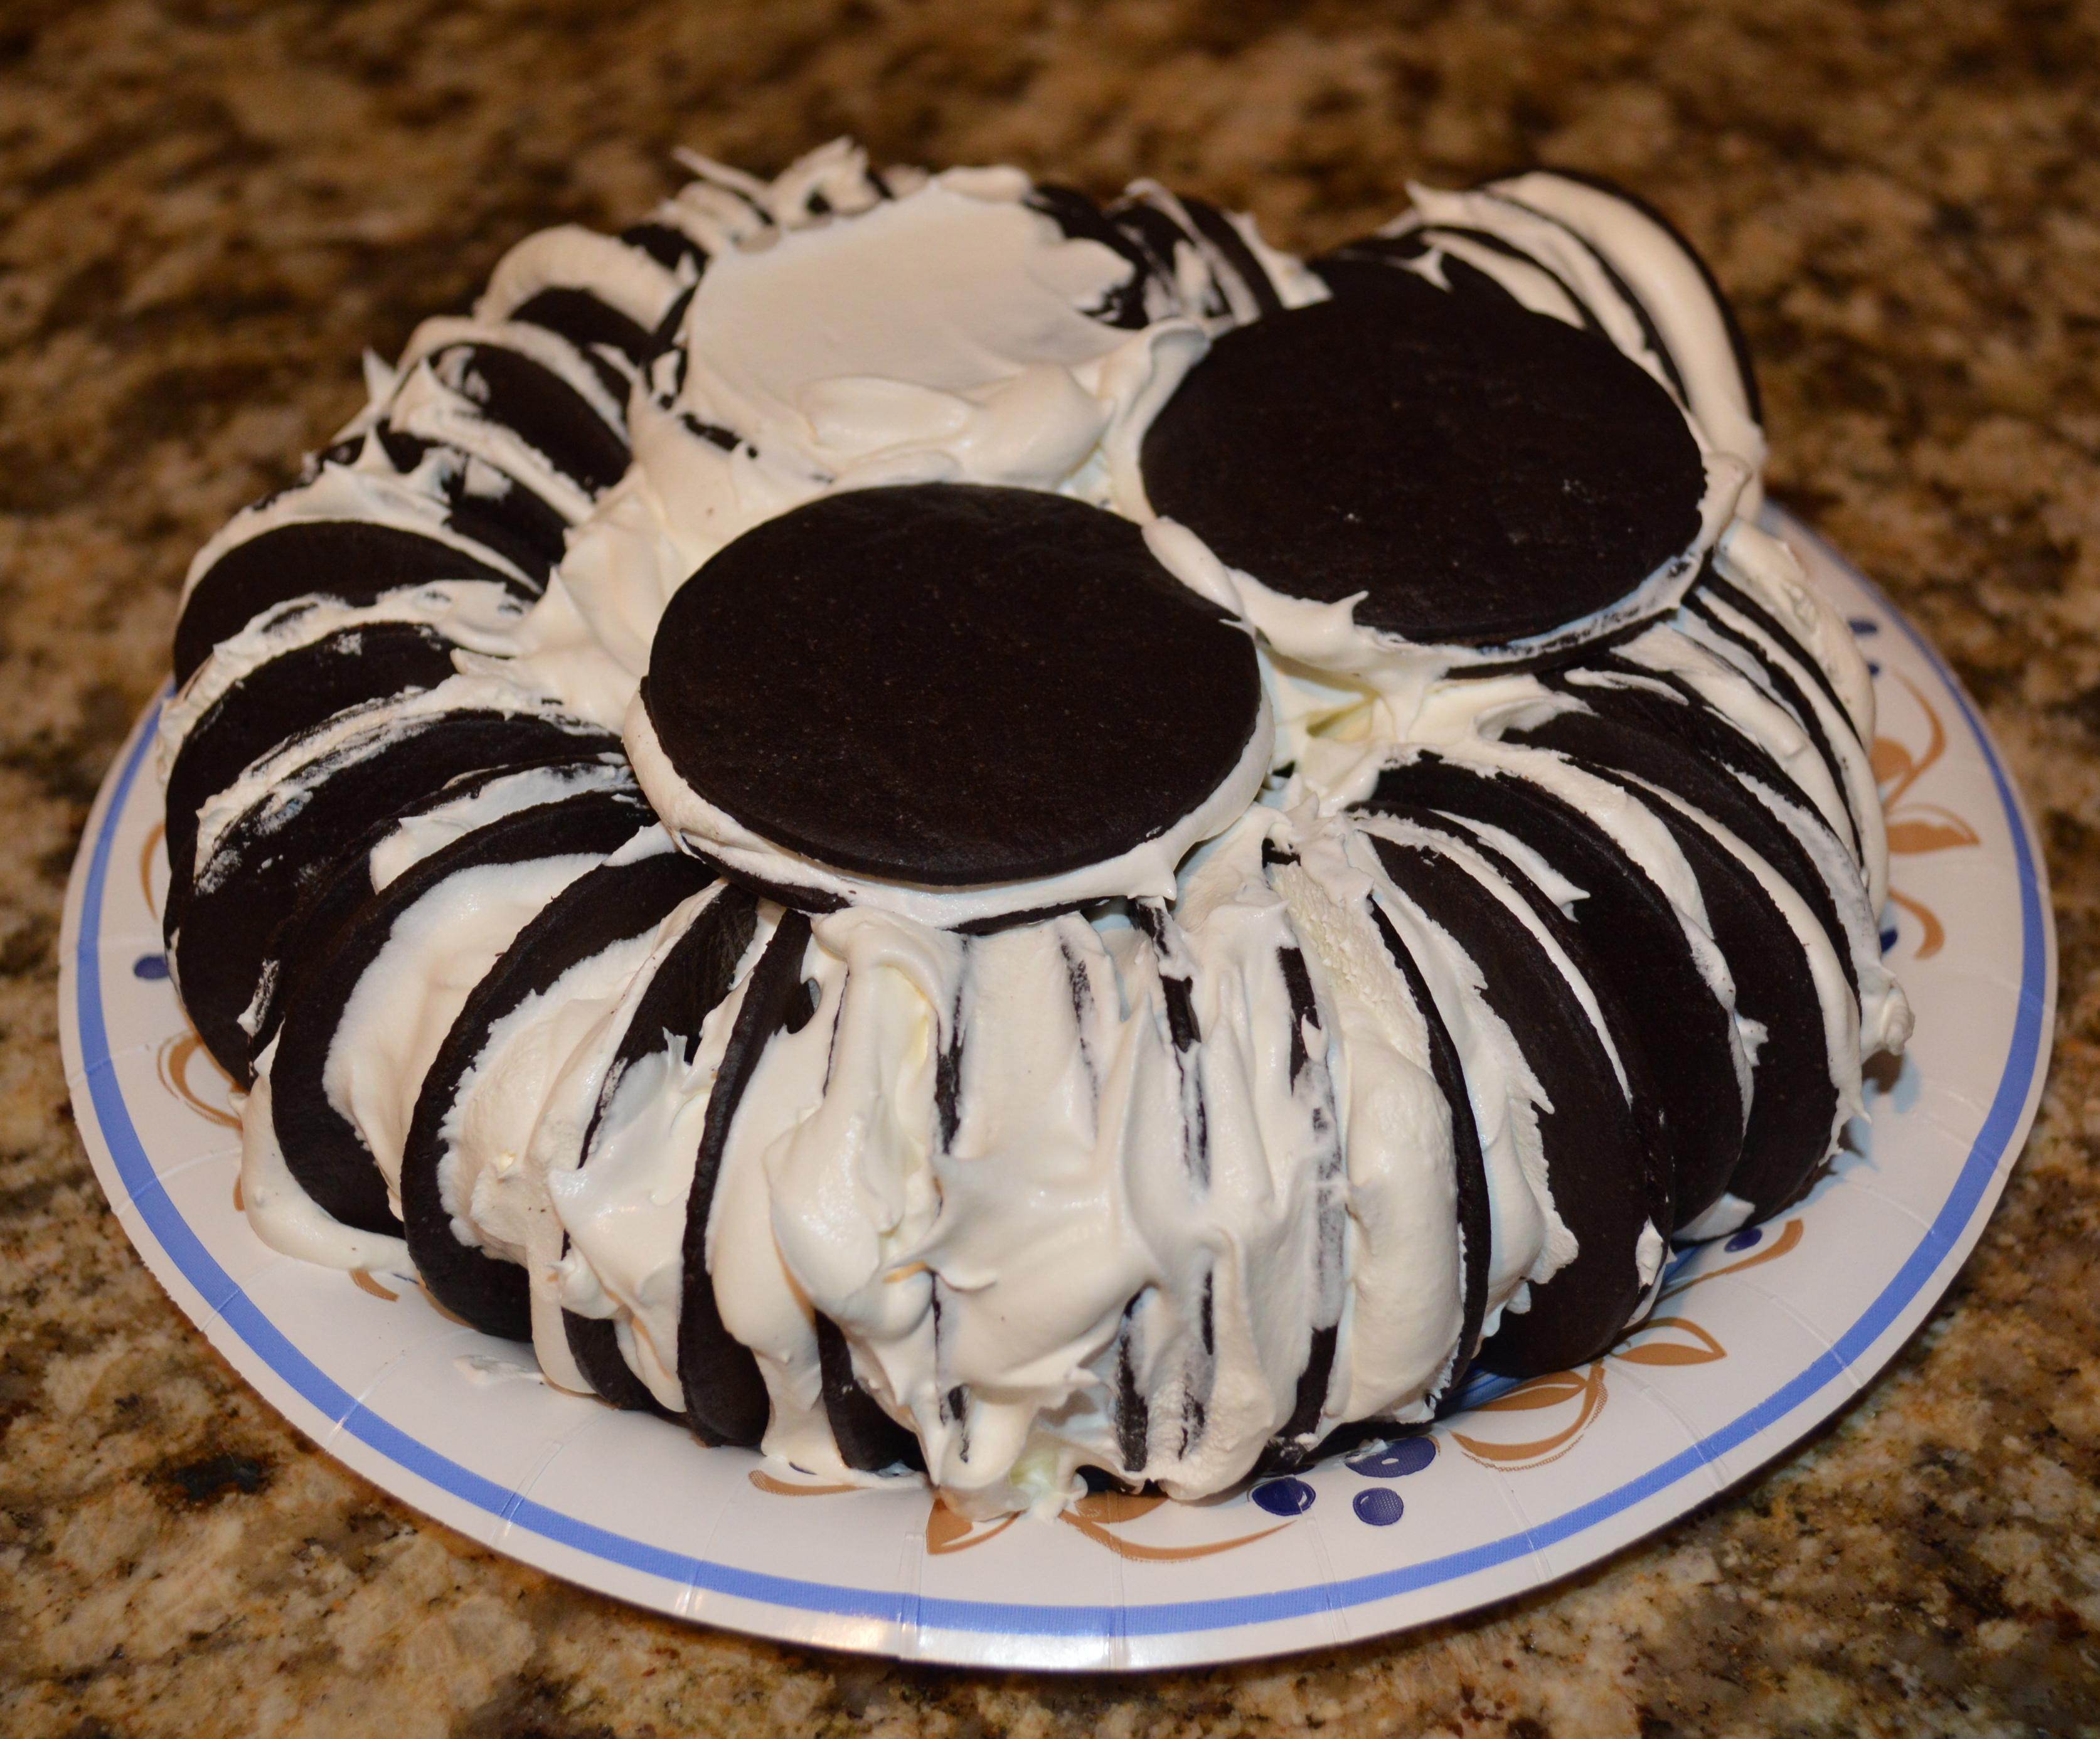 Igloo Refrigerator Cake - Celebrate & Decorate